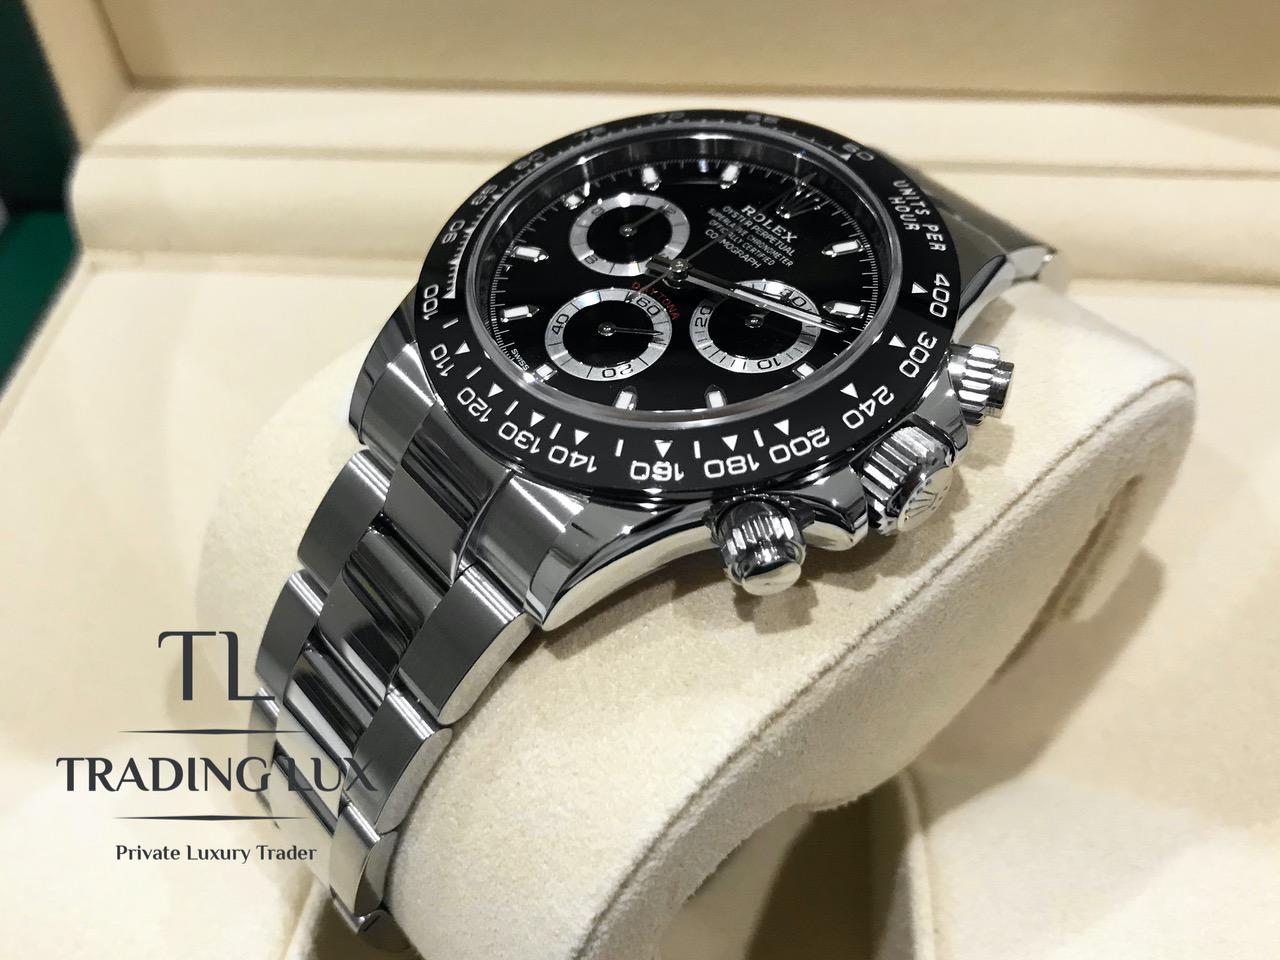 Rolex-Daytona-116500LN-Black-8